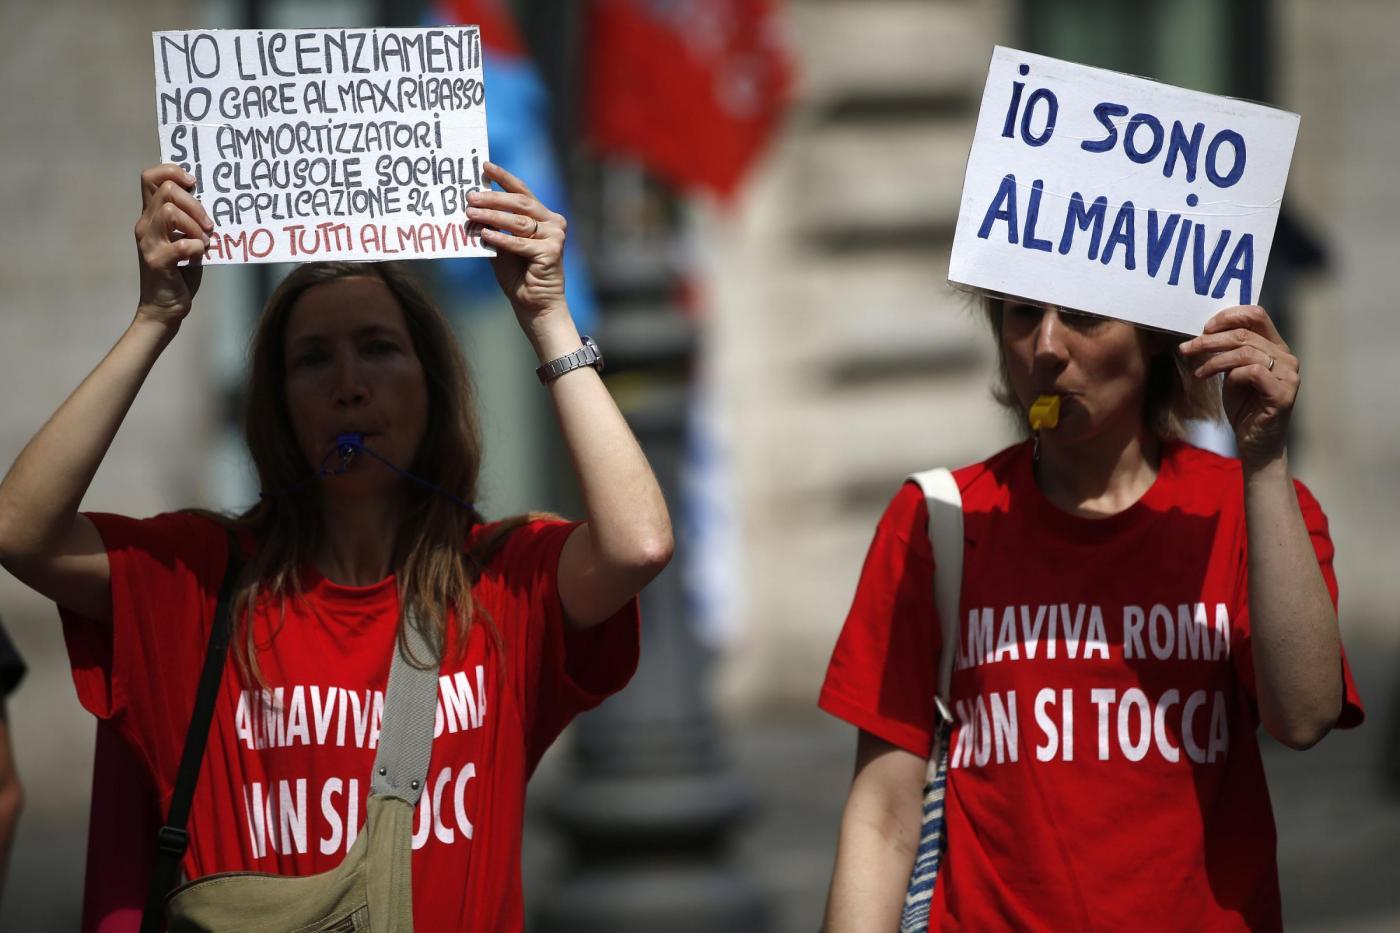 Almaviva, trovato l'accordo: salvi 3 mila posti di lavoro